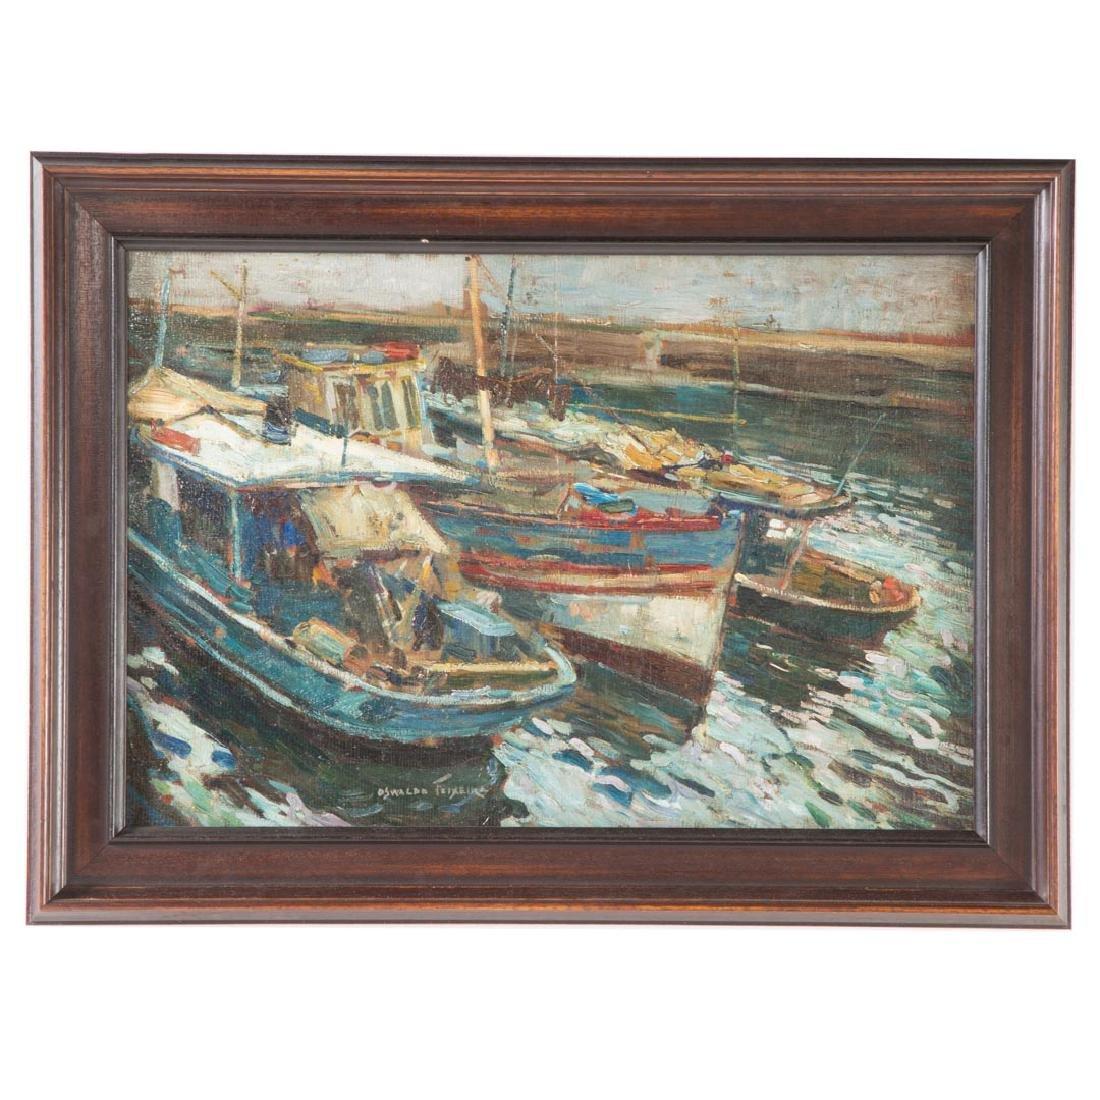 Oswaldo Tiexeira. Moored Fishing Boats, oil